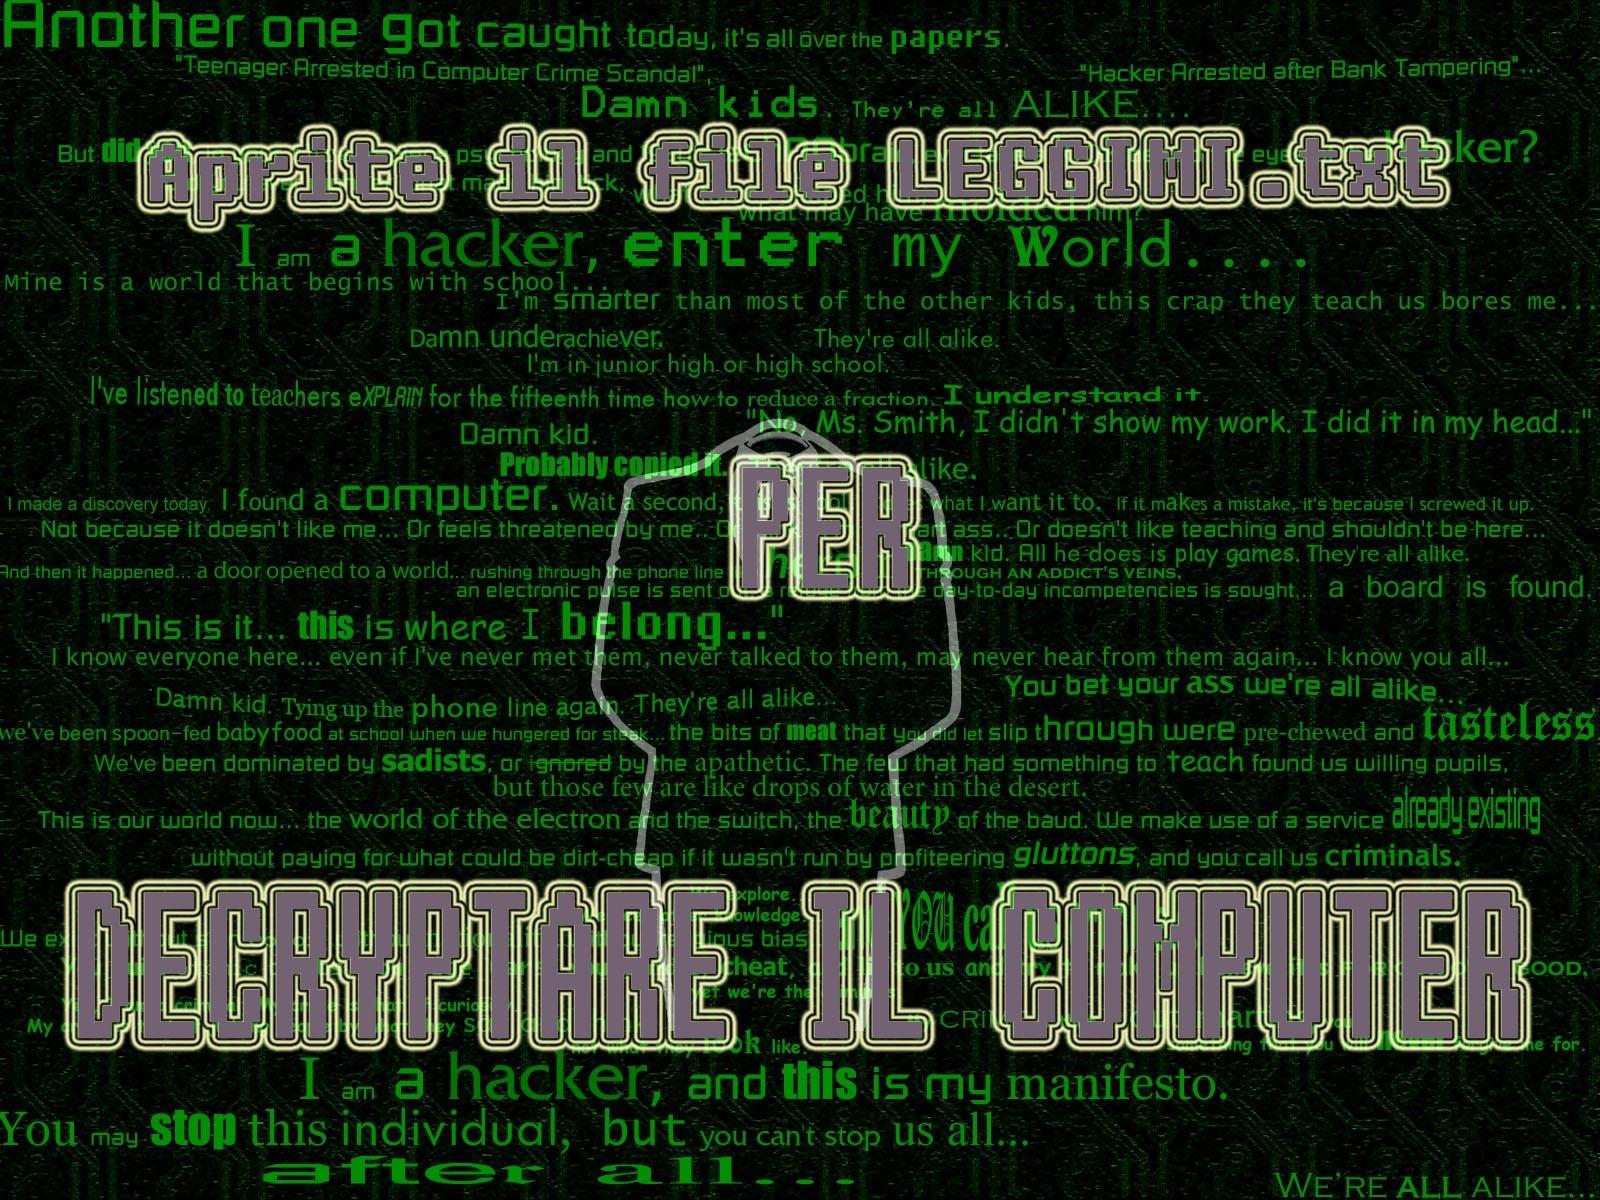 stf-aviso-ransomware-crypt888-virus-mircop-brazil-ransom-message-variant